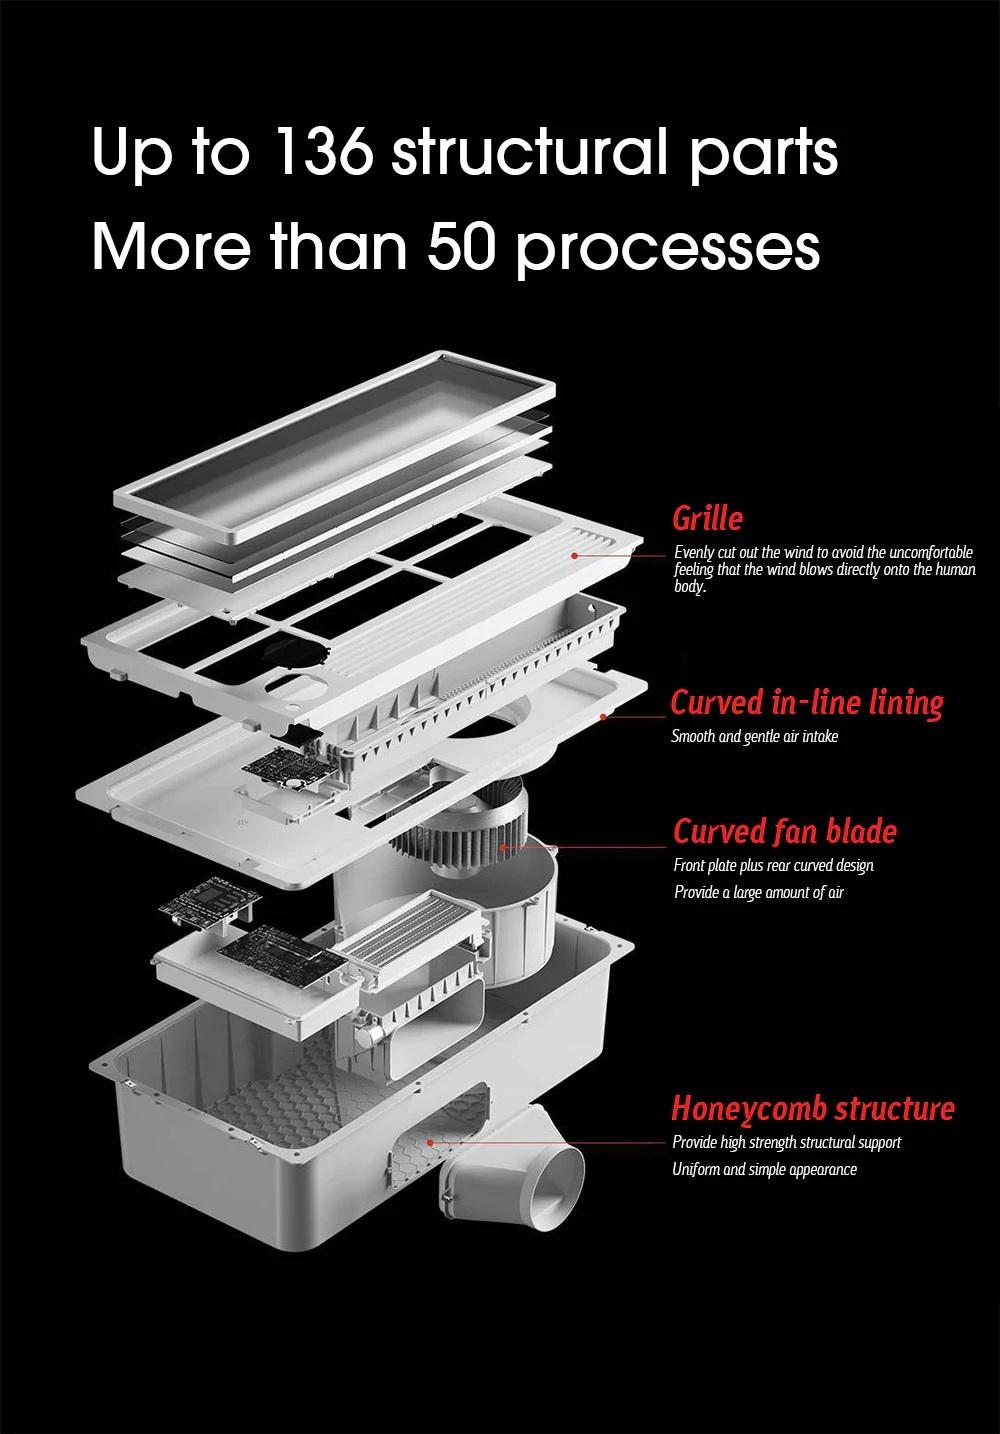 XiaomiYeelightSmart BathHeater Diseño 136 piezas